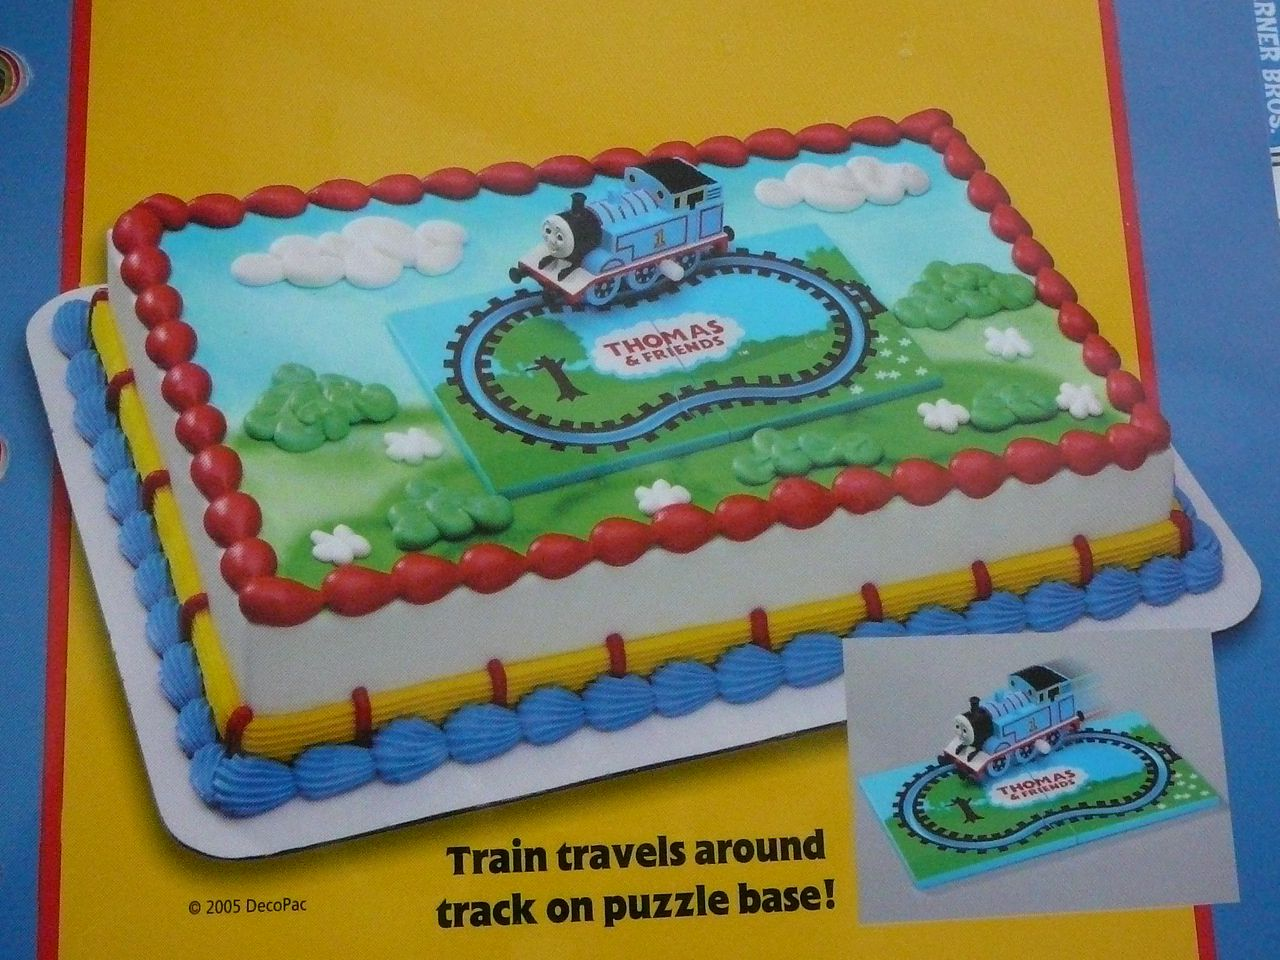 Thomas The Train Birthday Cake Google Search Decorated Cakes - Thomas birthday cake images